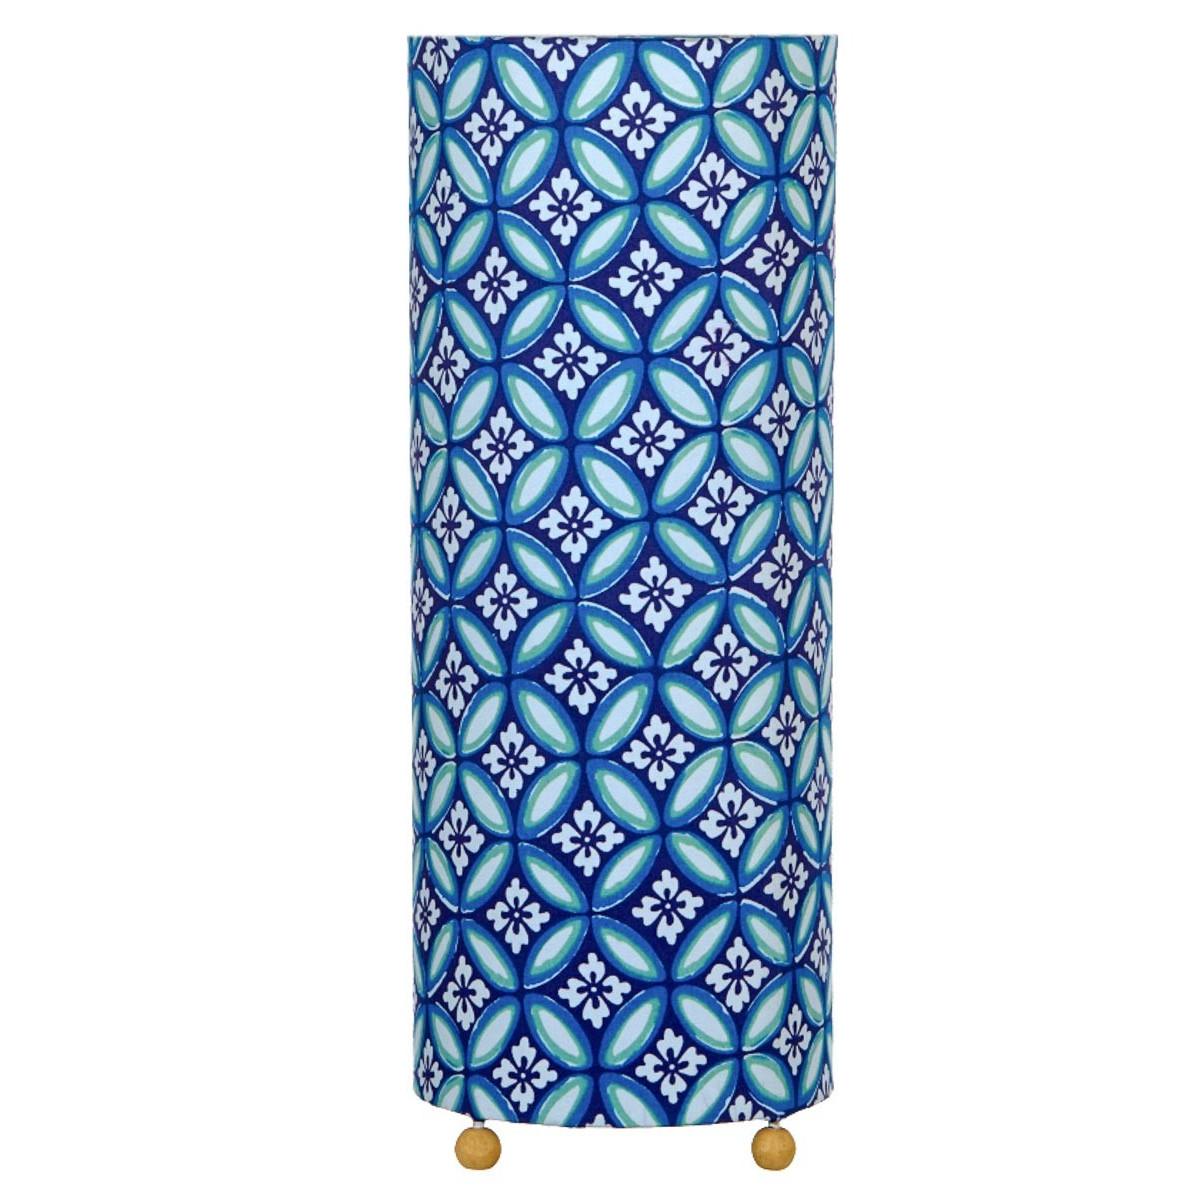 Lampe de chevet tissu Azulejos bleu